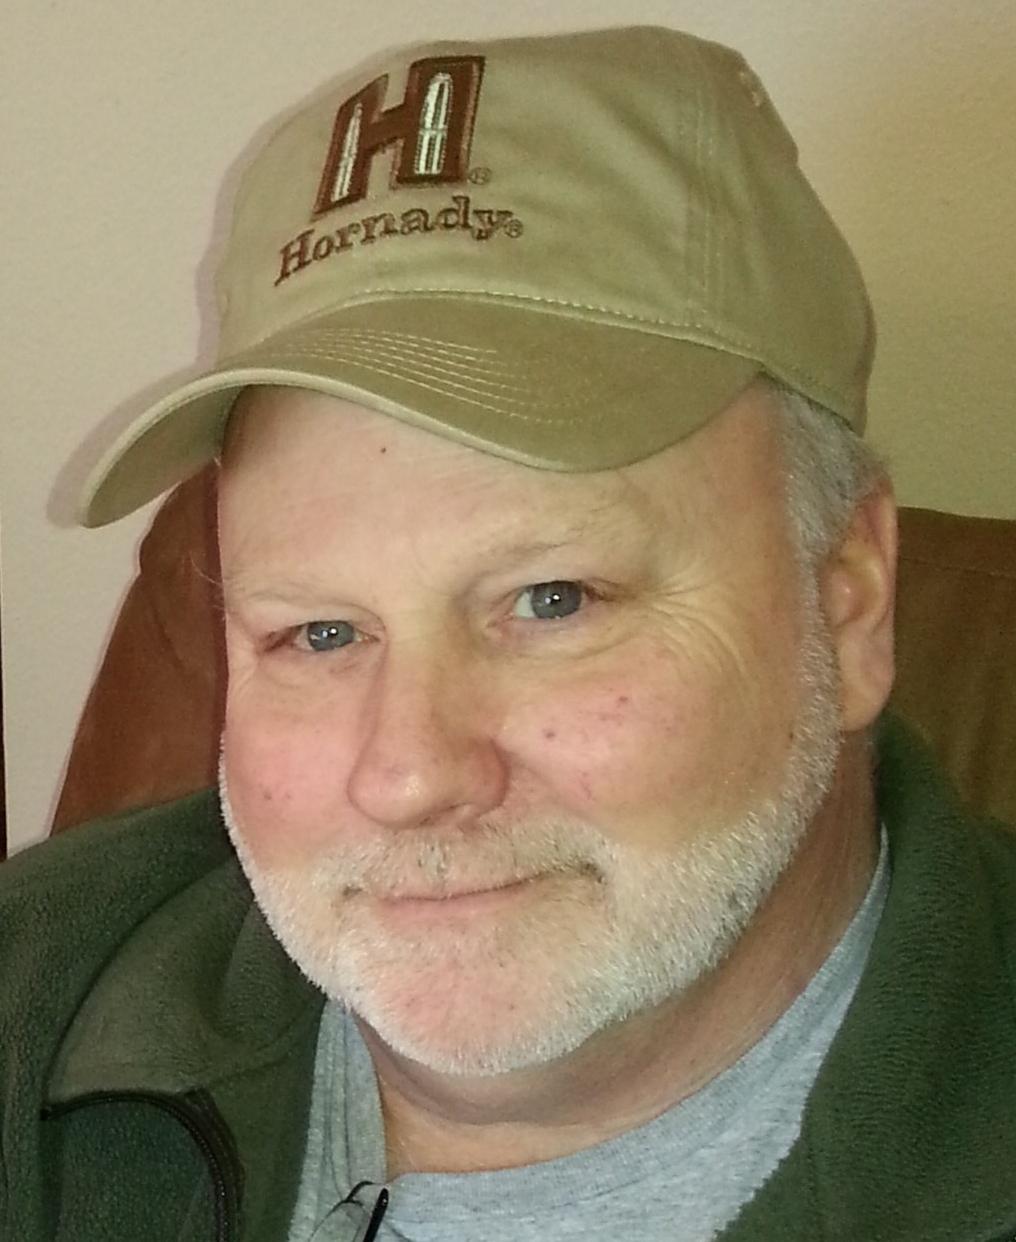 Rick Johnson 08/21/2014